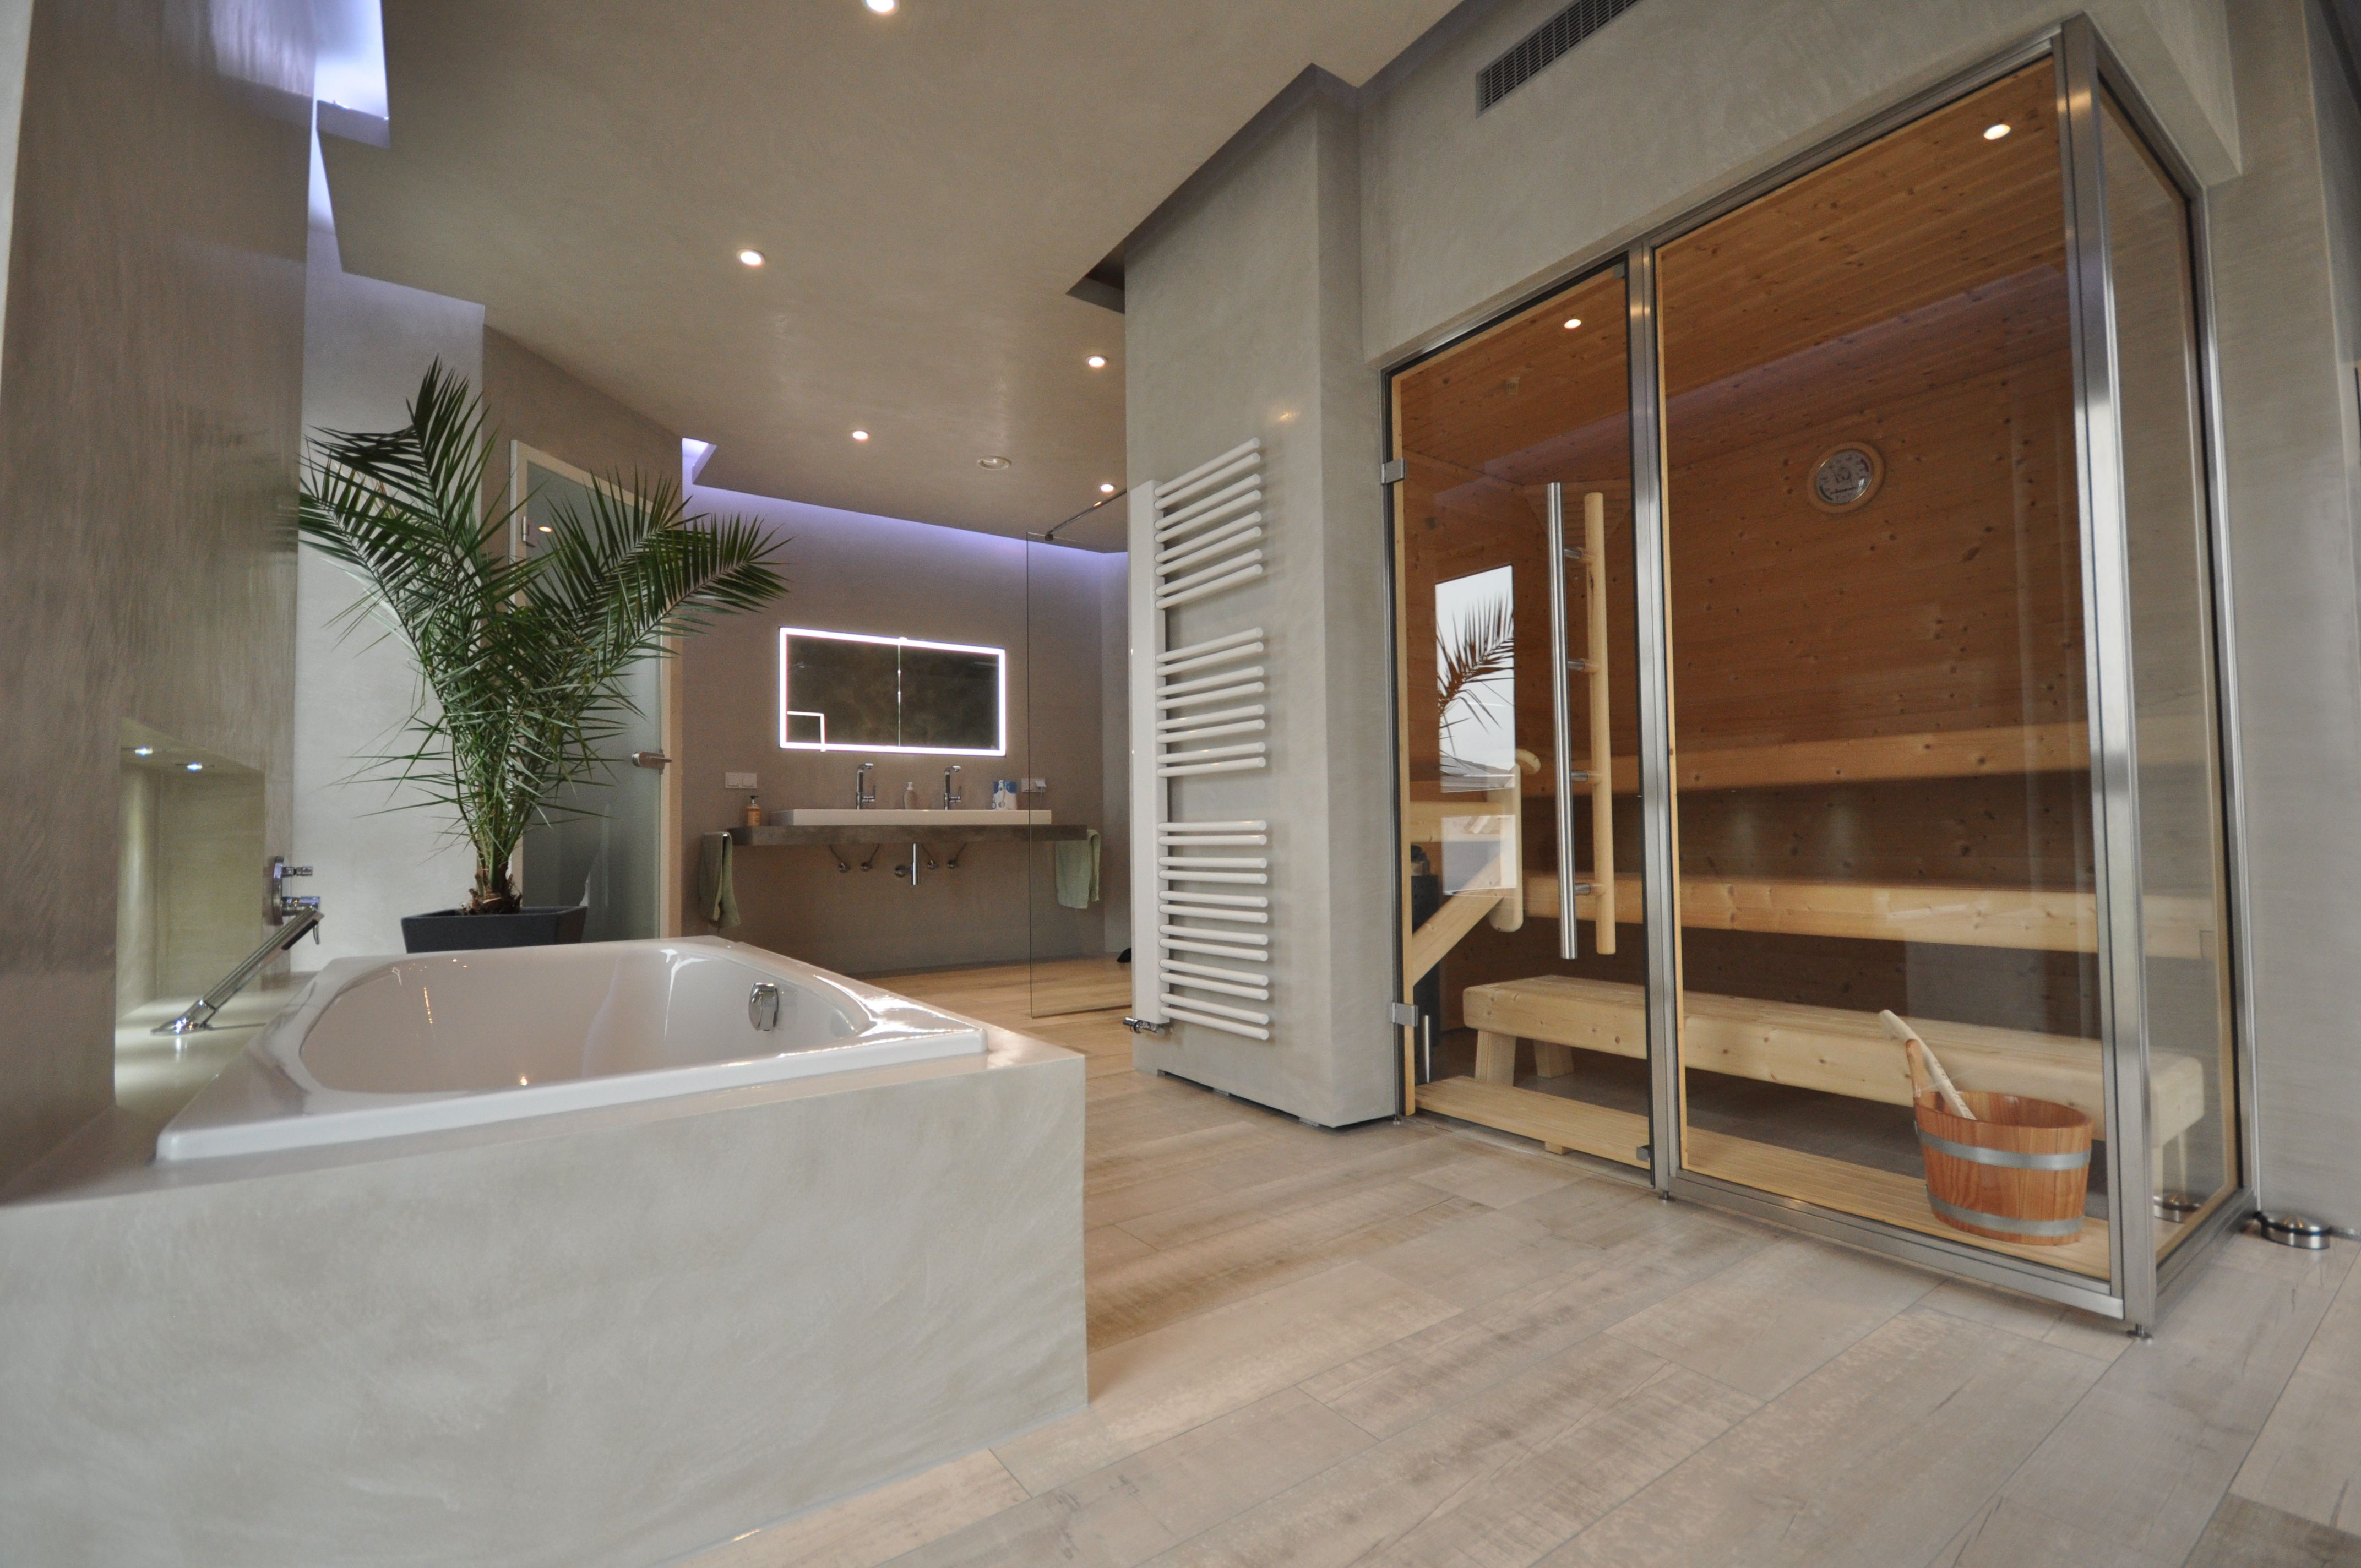 Designbad Kalk Marmor Putz Fugenlose Wandflächen In